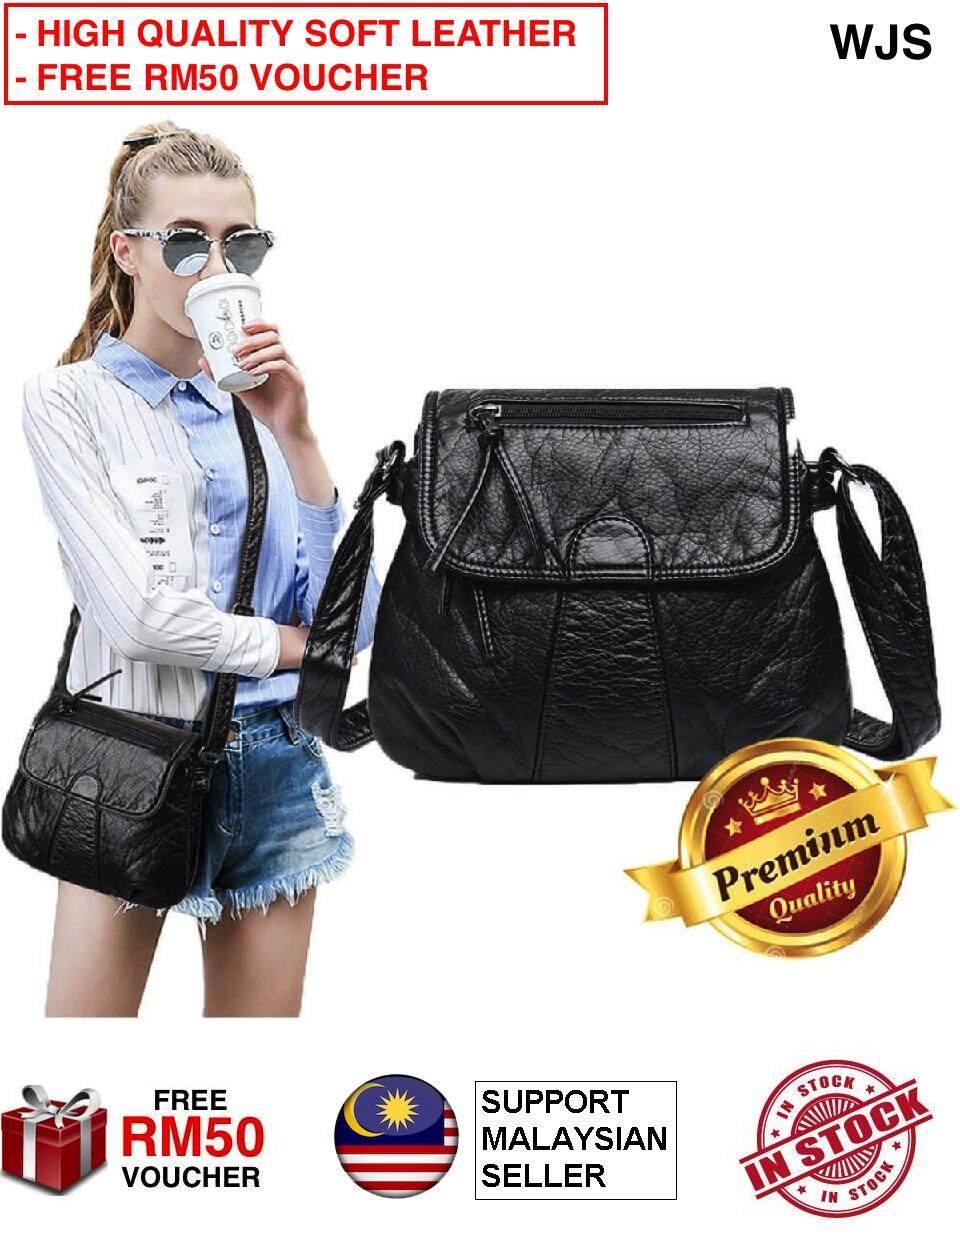 (HIGH QUALITY SOFT LEATHER) WJS Sling Bag Handbag Women Messenger Bag Crossbody Soft PU Leather Shoulder Bag High Quality Fashion Women Bags Handbags Water Resistant BLACK (FREE RM50 VOUCHER)